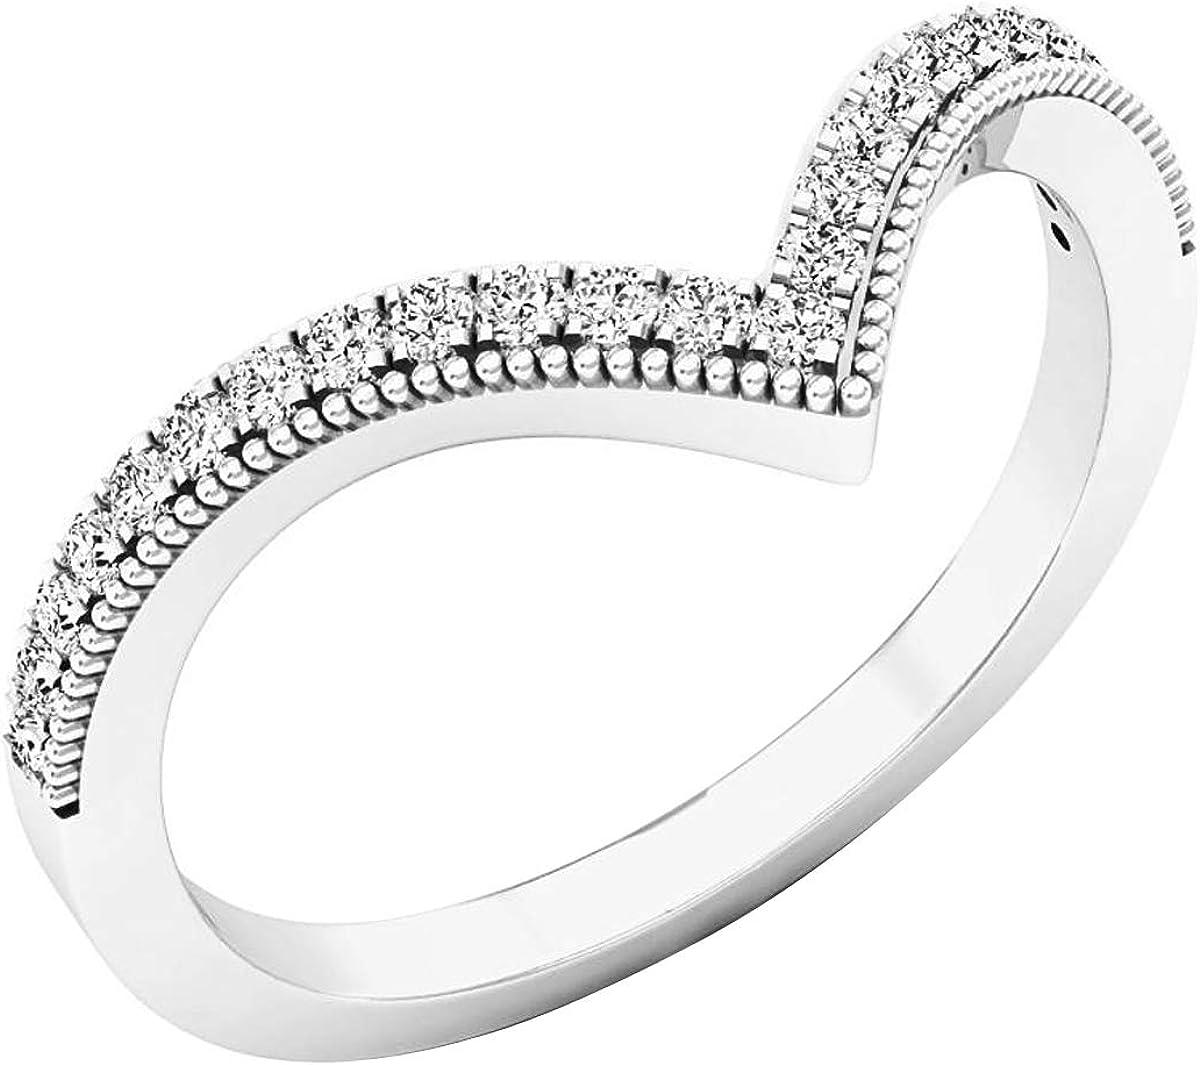 Dazzlingrock collection 0.20 Carat (ctw) Round White Diamond Ladies Chevron Wedding Band 1/5 CT, 10K Gold